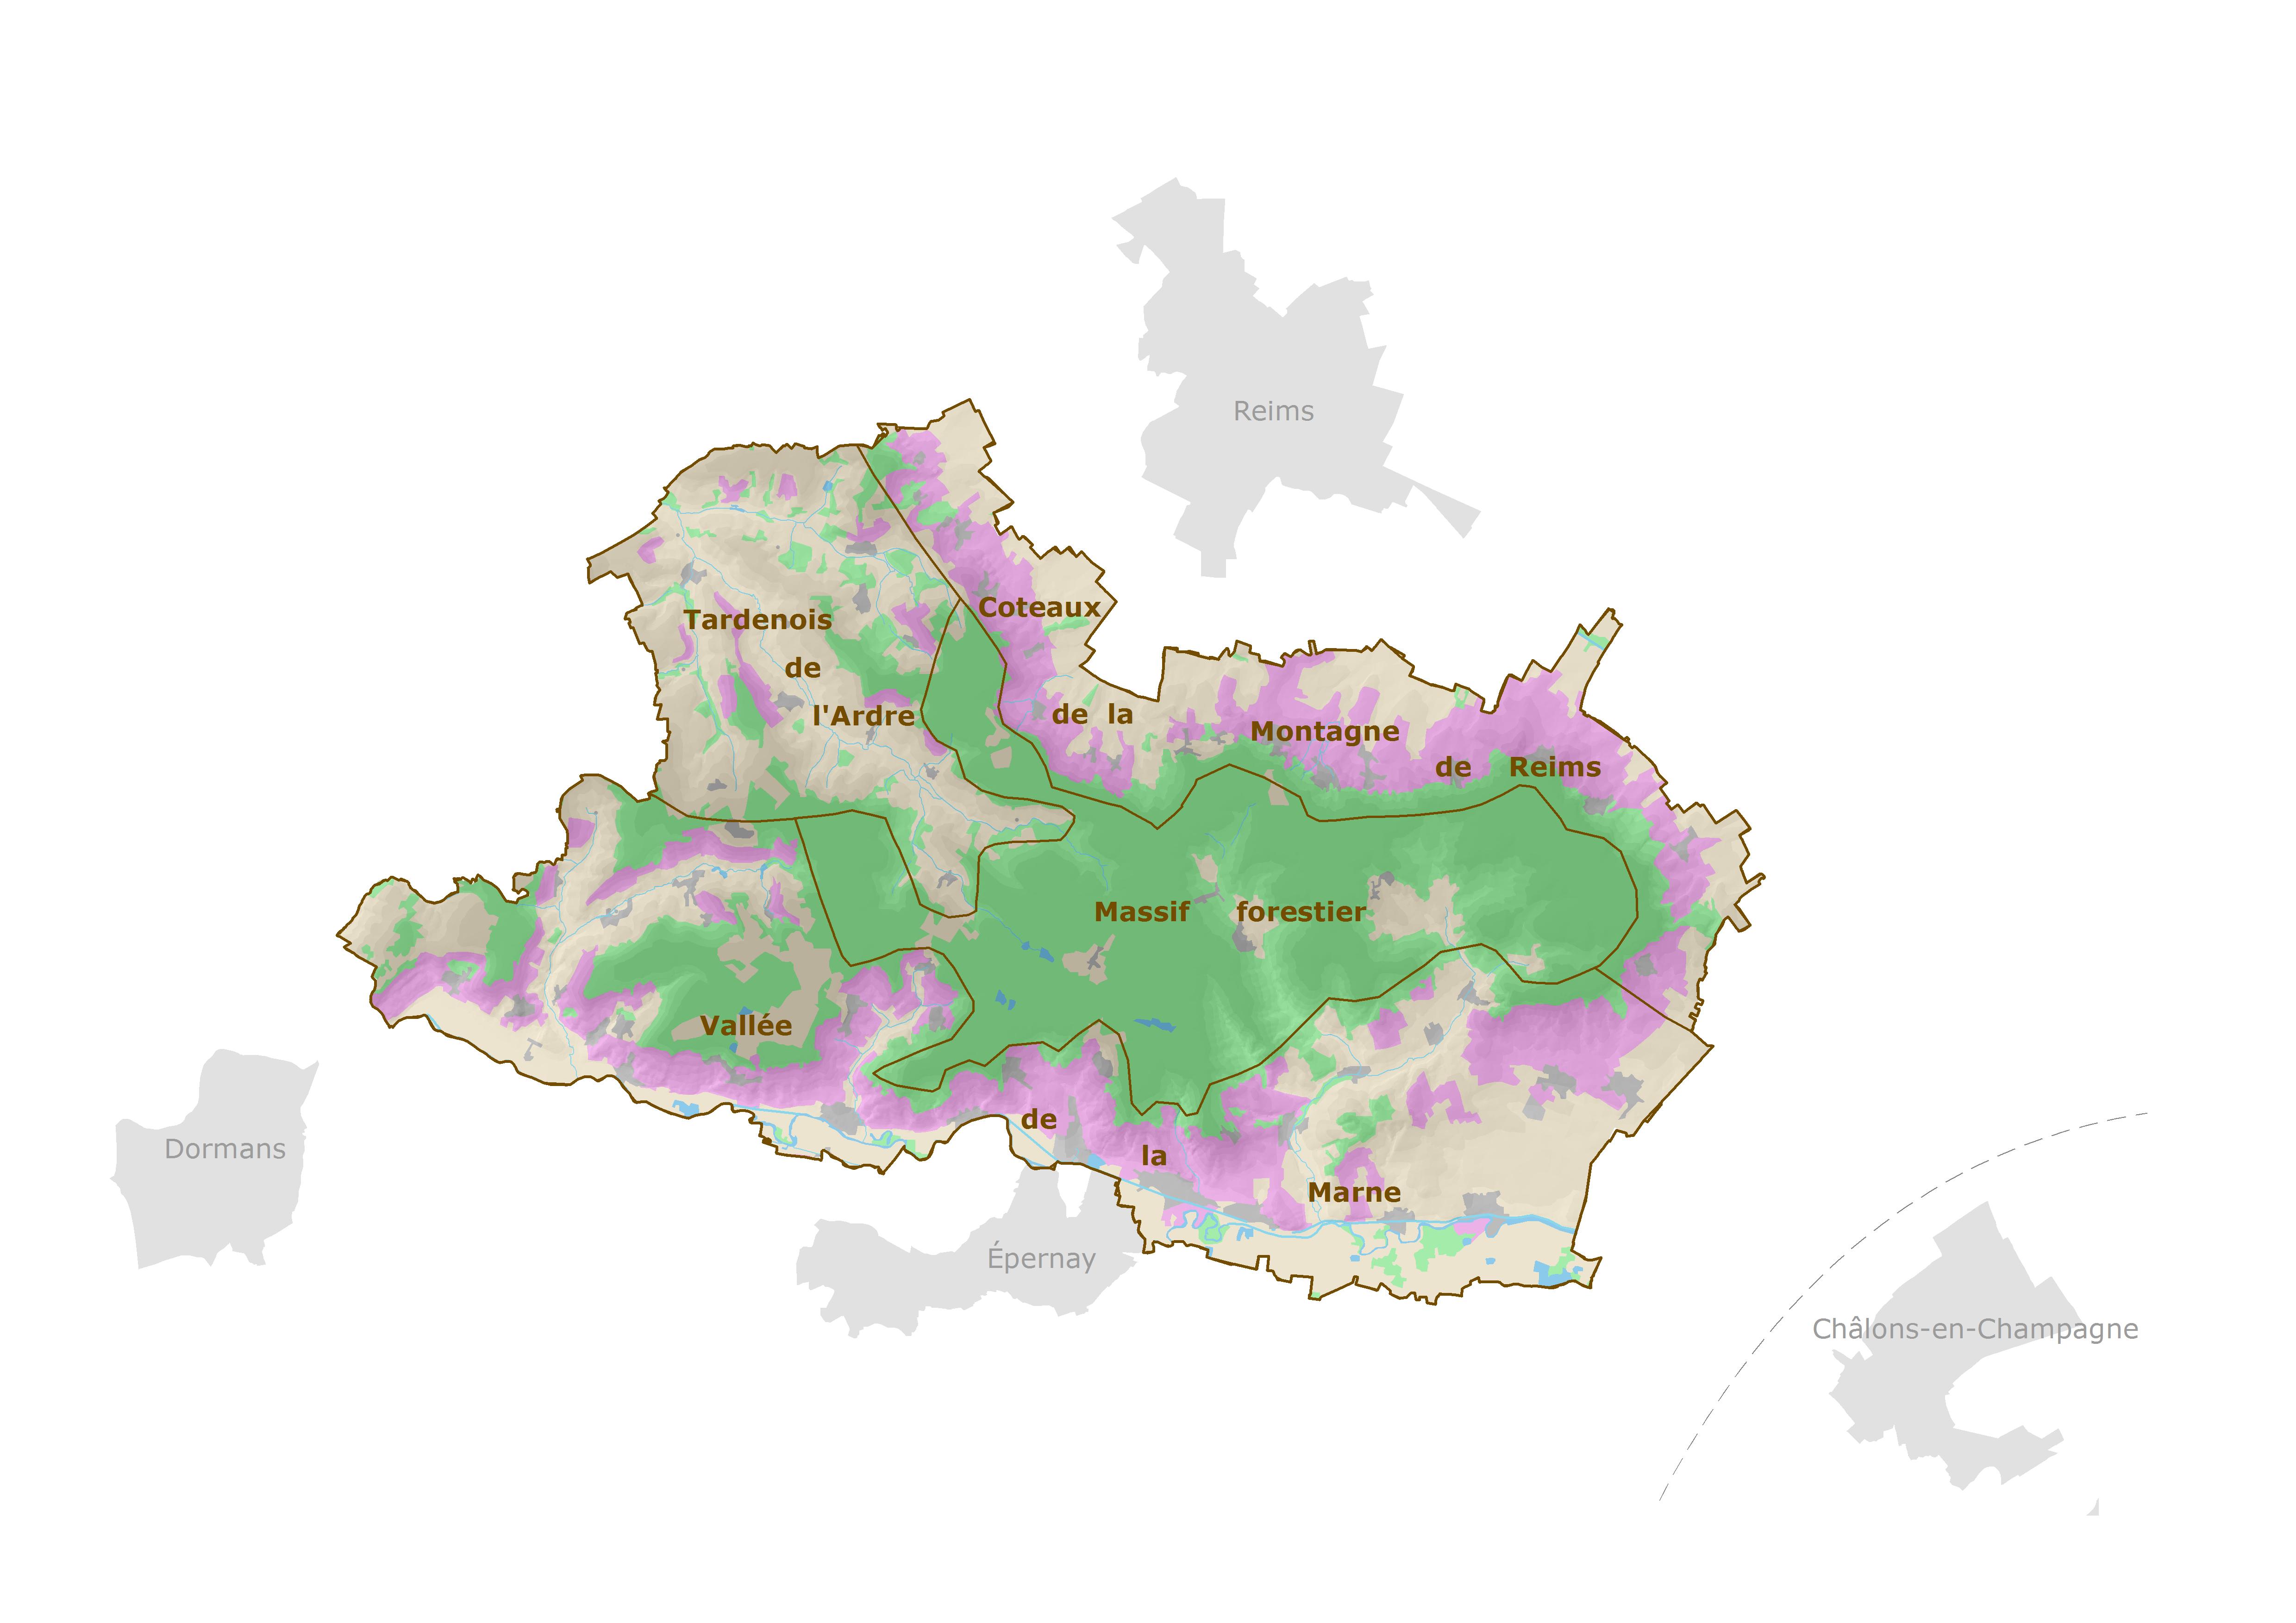 4 natural regions